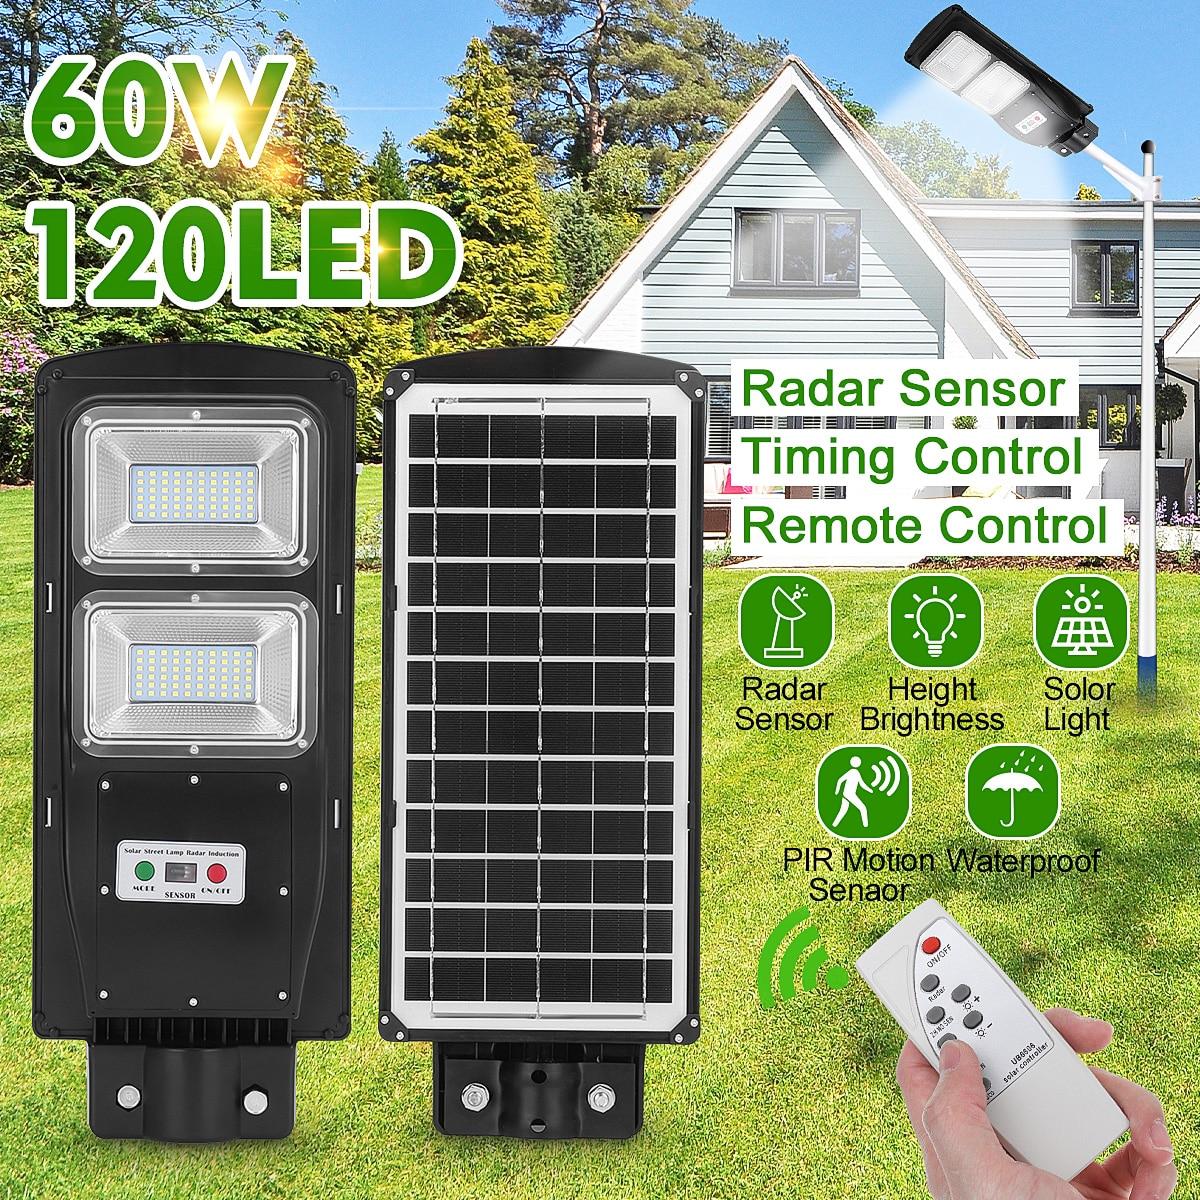 90W LED Solar Street Light 60W Wall Garden Lights Waterproof Outdoor Lighting with Remote Dusk to Dawn PIR Motion Sensor enlarge